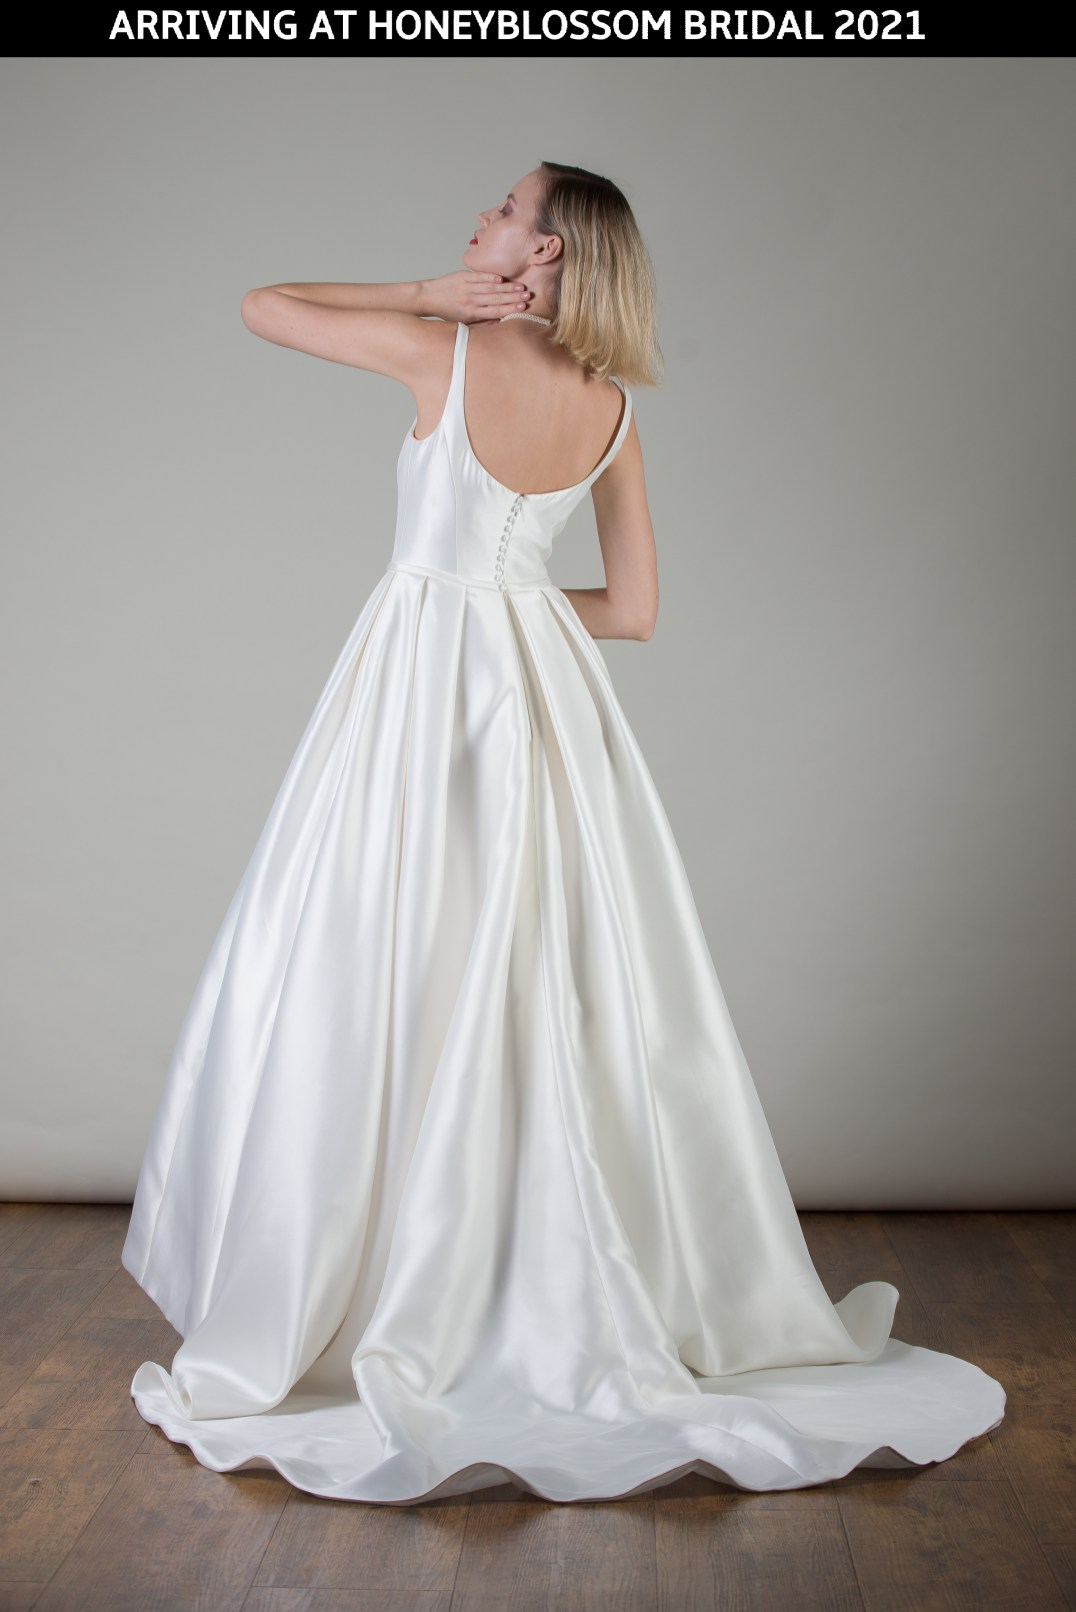 MiaMia Bologna wedding dress arriving soon to Honeyblossom Bridal